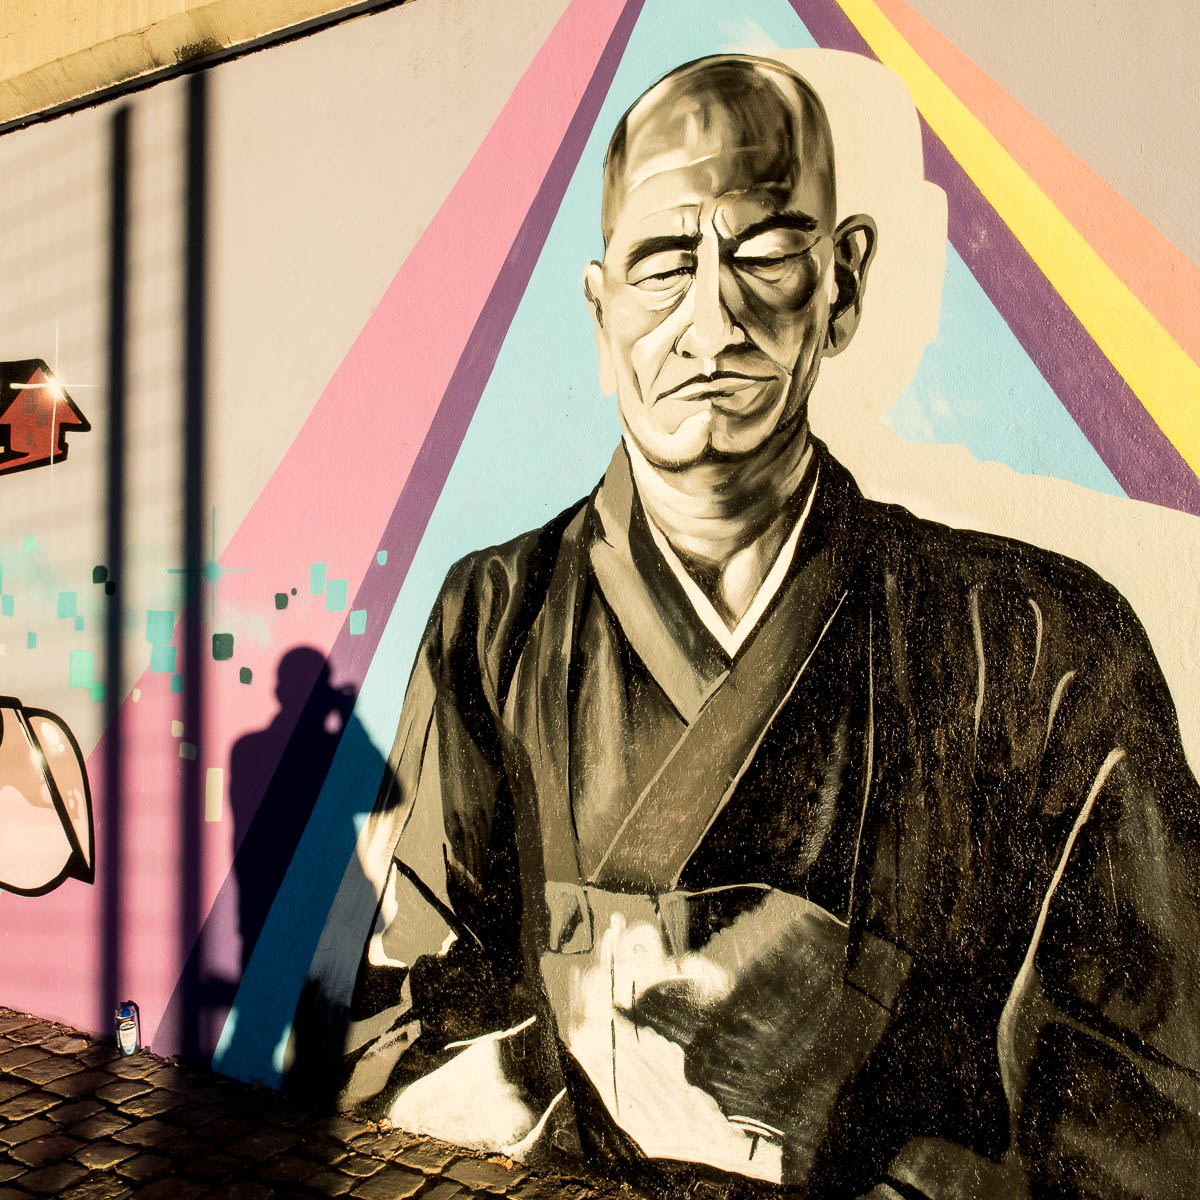 2015-09-29 EM1 Graffiti Frankfurt Friedensbrücke 0030